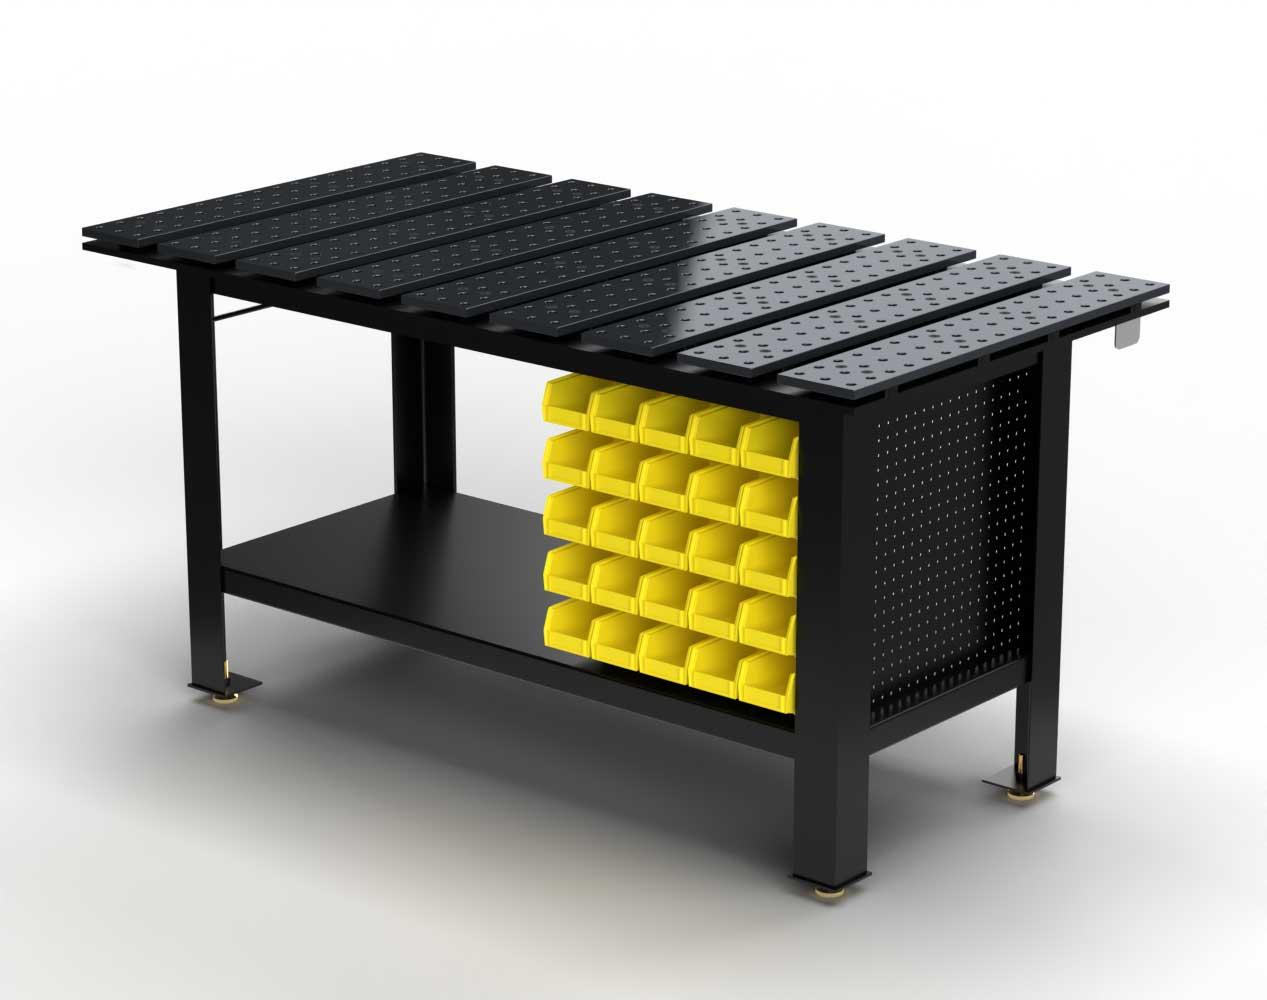 Extra Heavy Duty Weld Fixture Table – 70 in. W x 36 in. D x 37 in. H